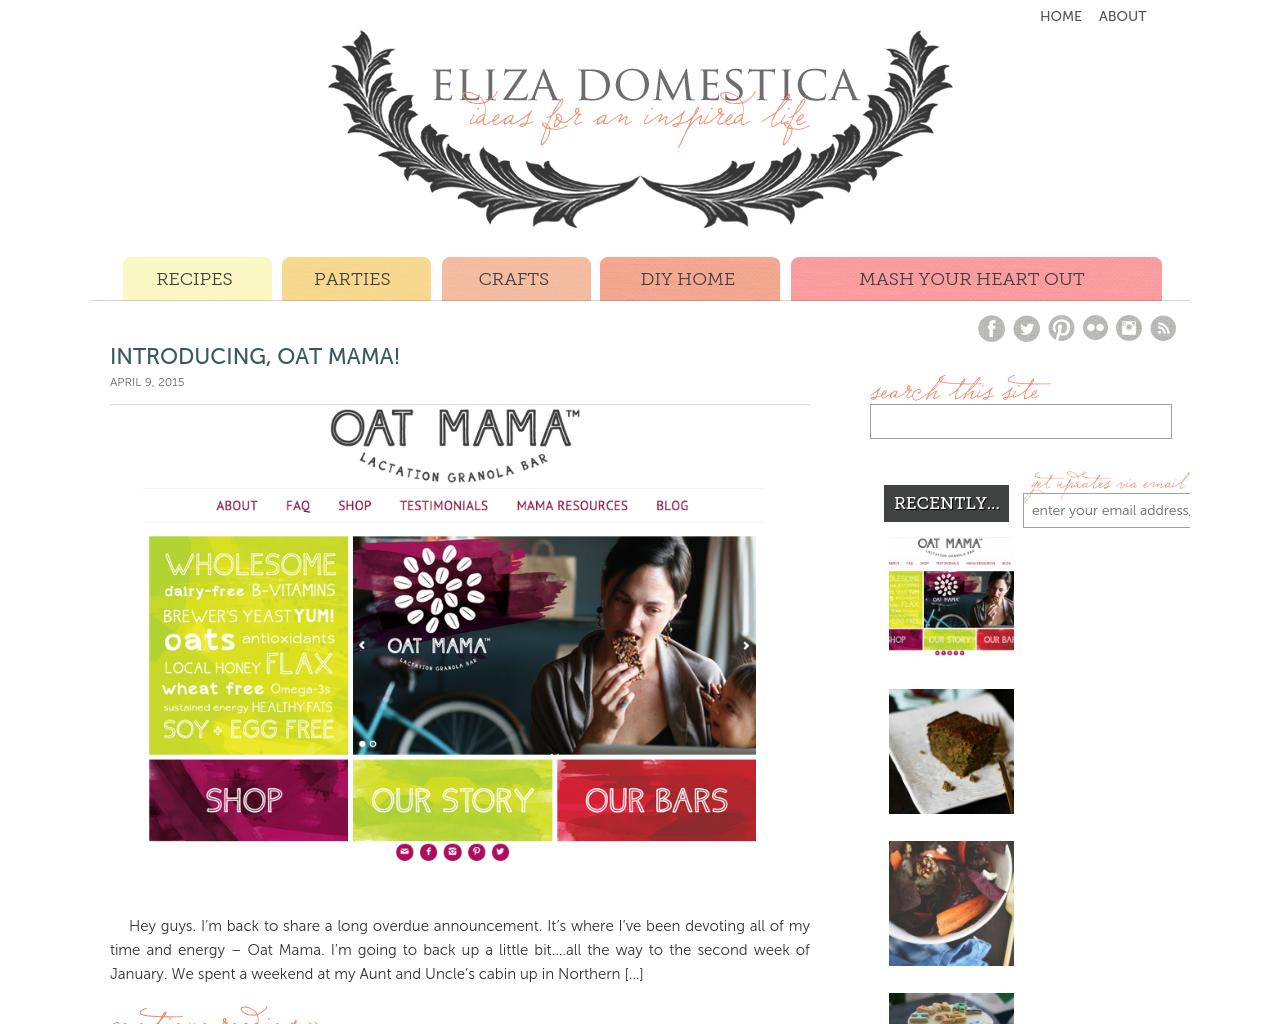 Eliza-Domestica-Advertising-Reviews-Pricing